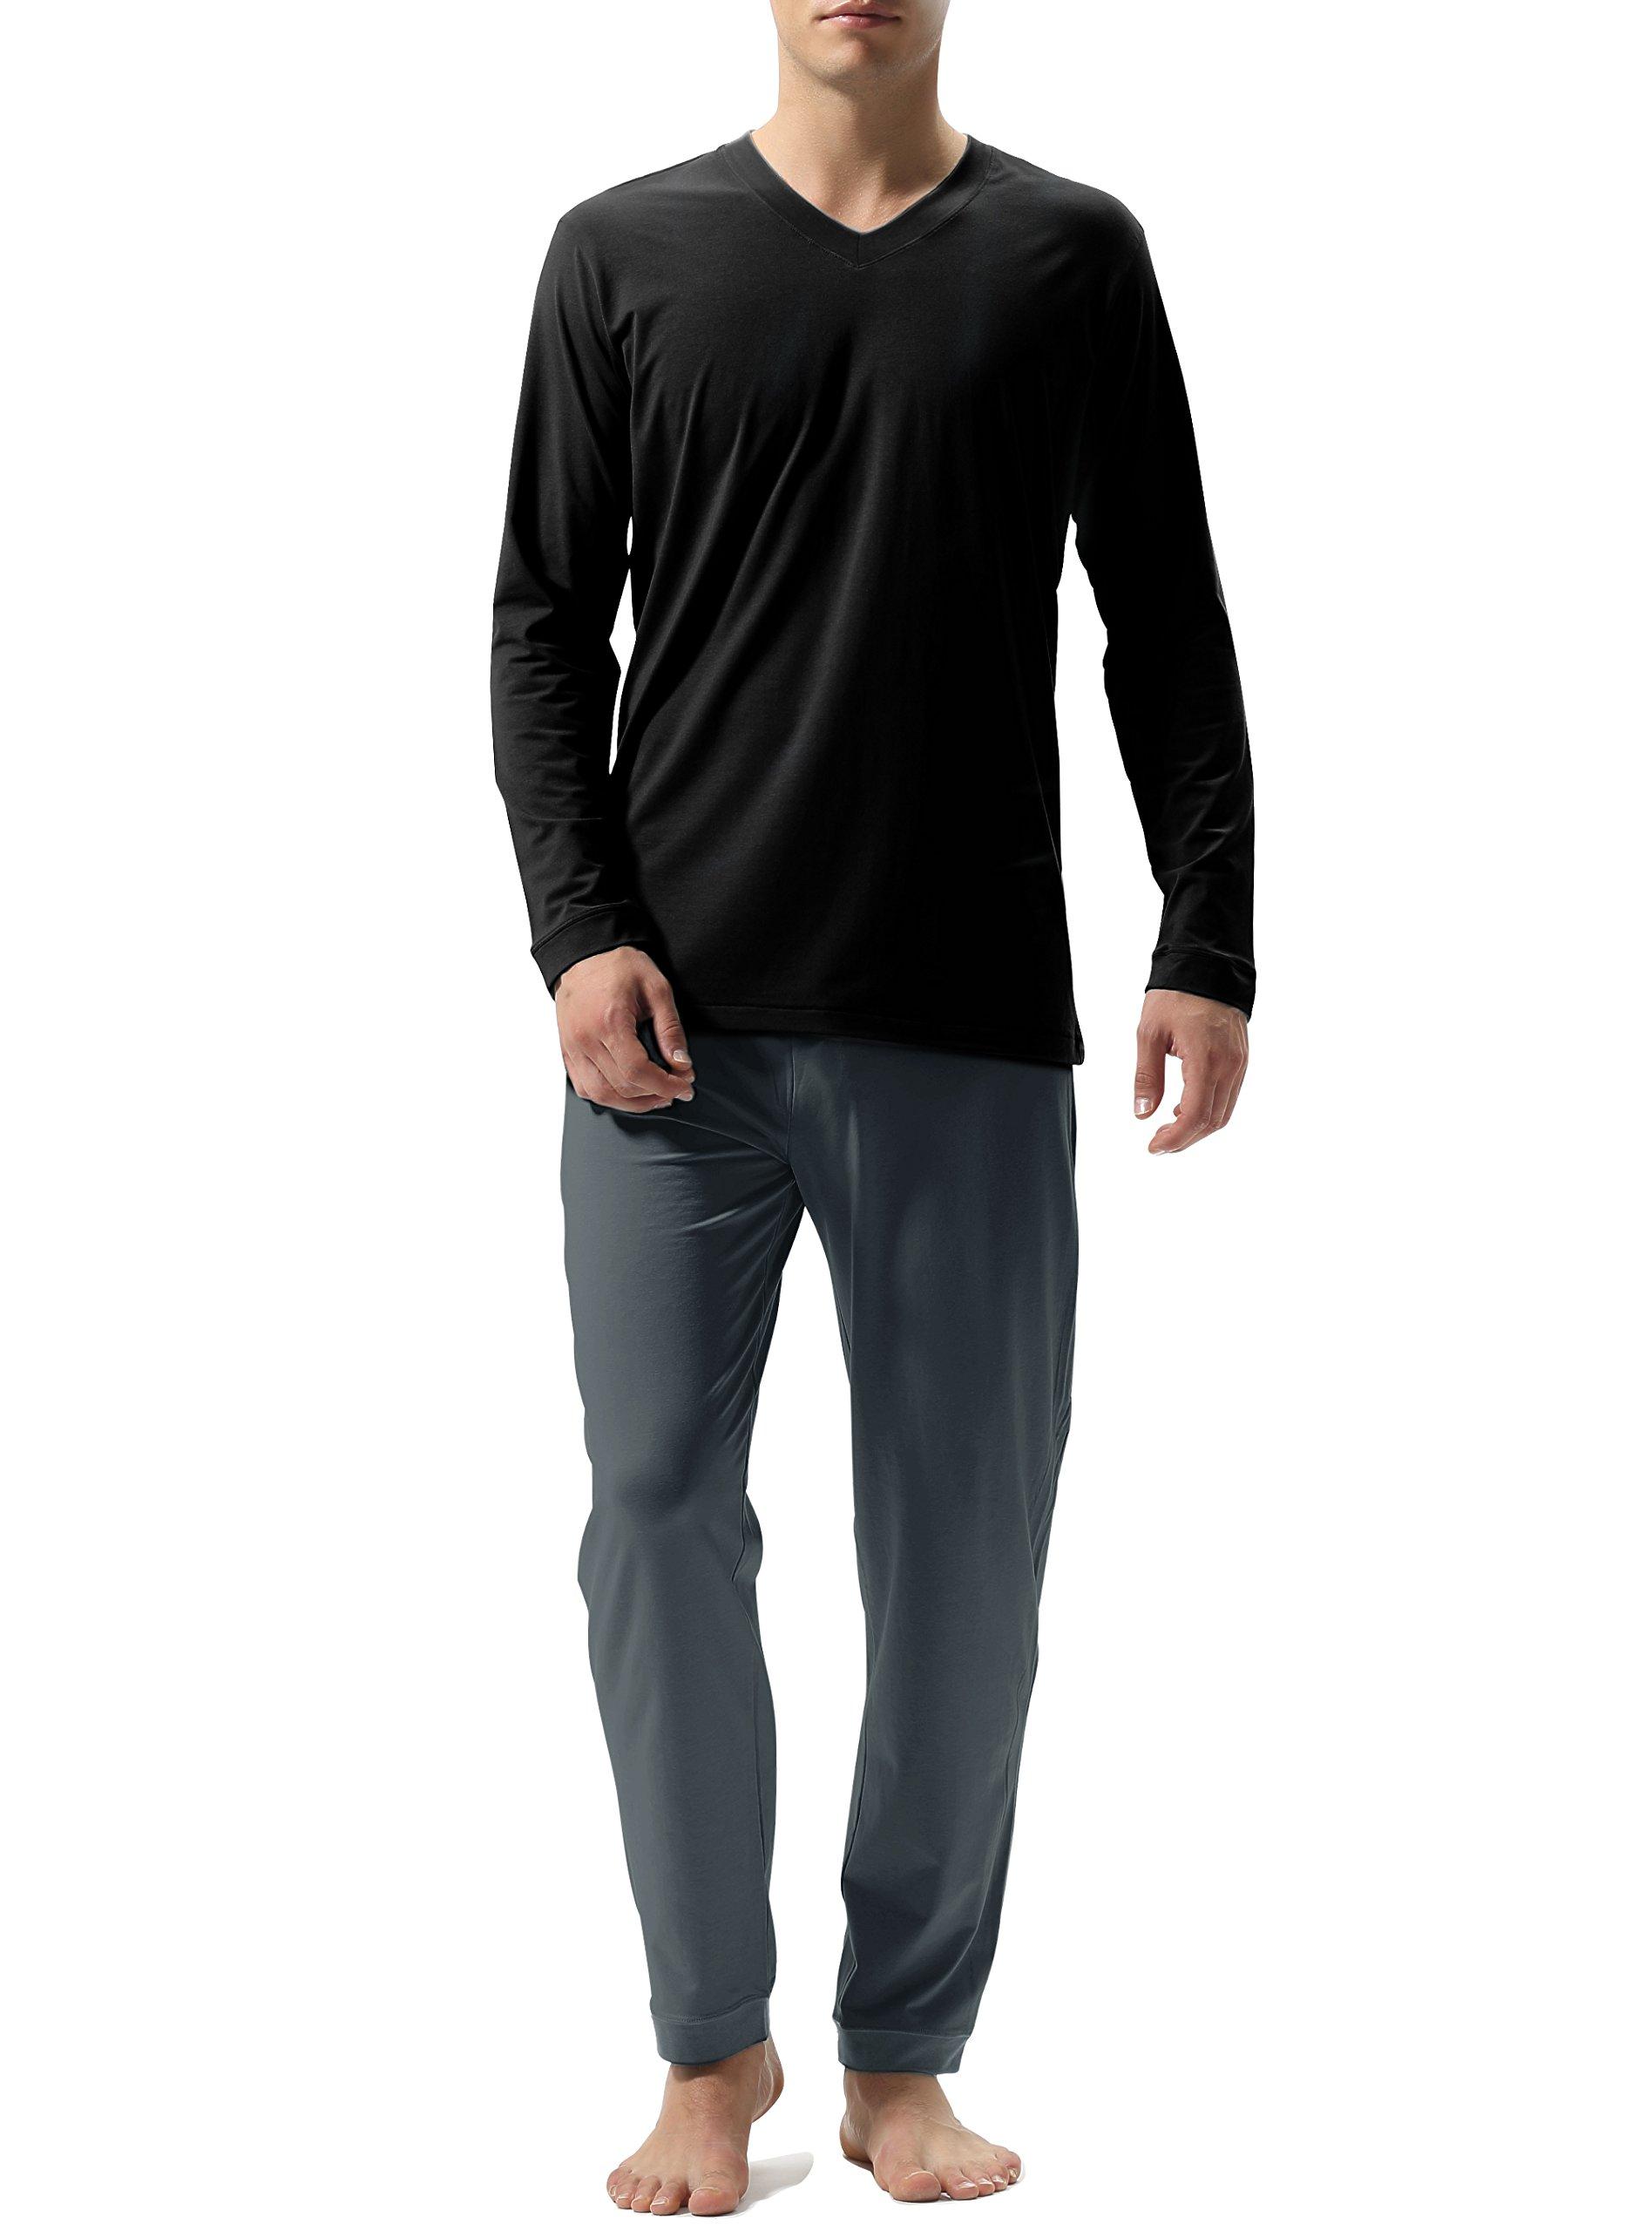 David Archy Men's Cotton Long Sleeve Sleep Top And Bottom Pajama Set (L, Black-Gray)